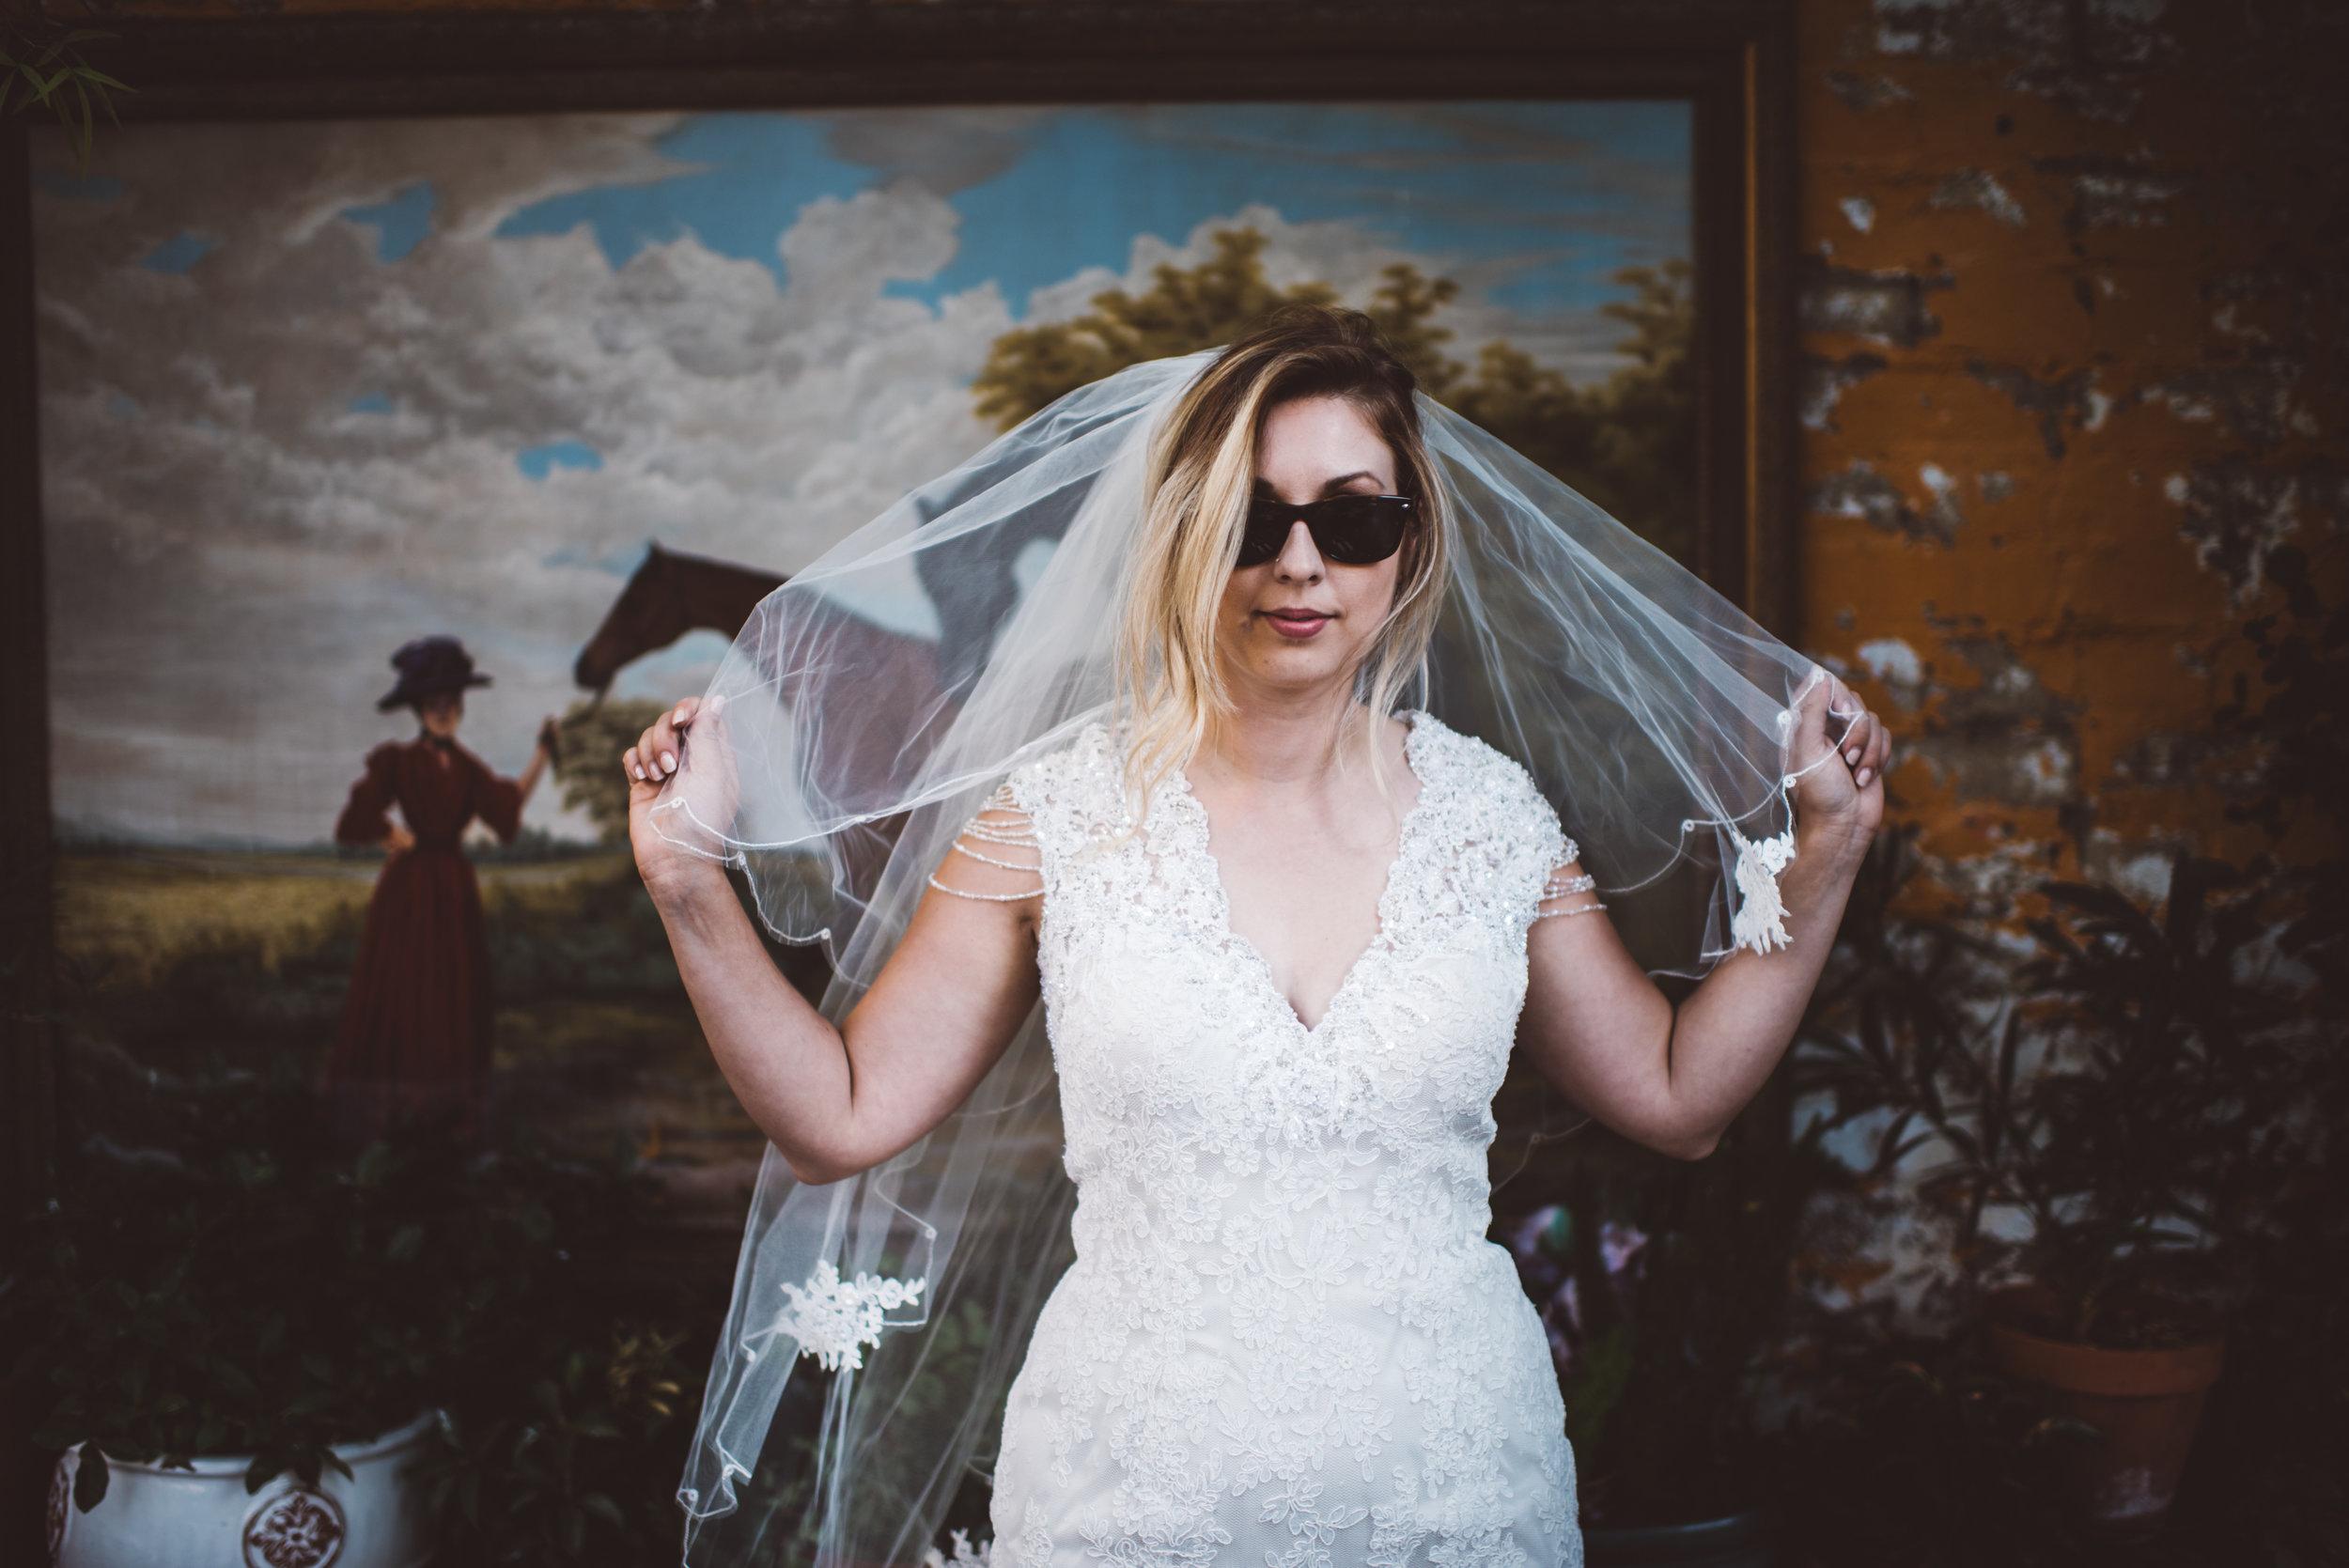 Las Vegas Elopement Photographer Ashley Marie Myers Rock'n Roll Bride-70.jpg